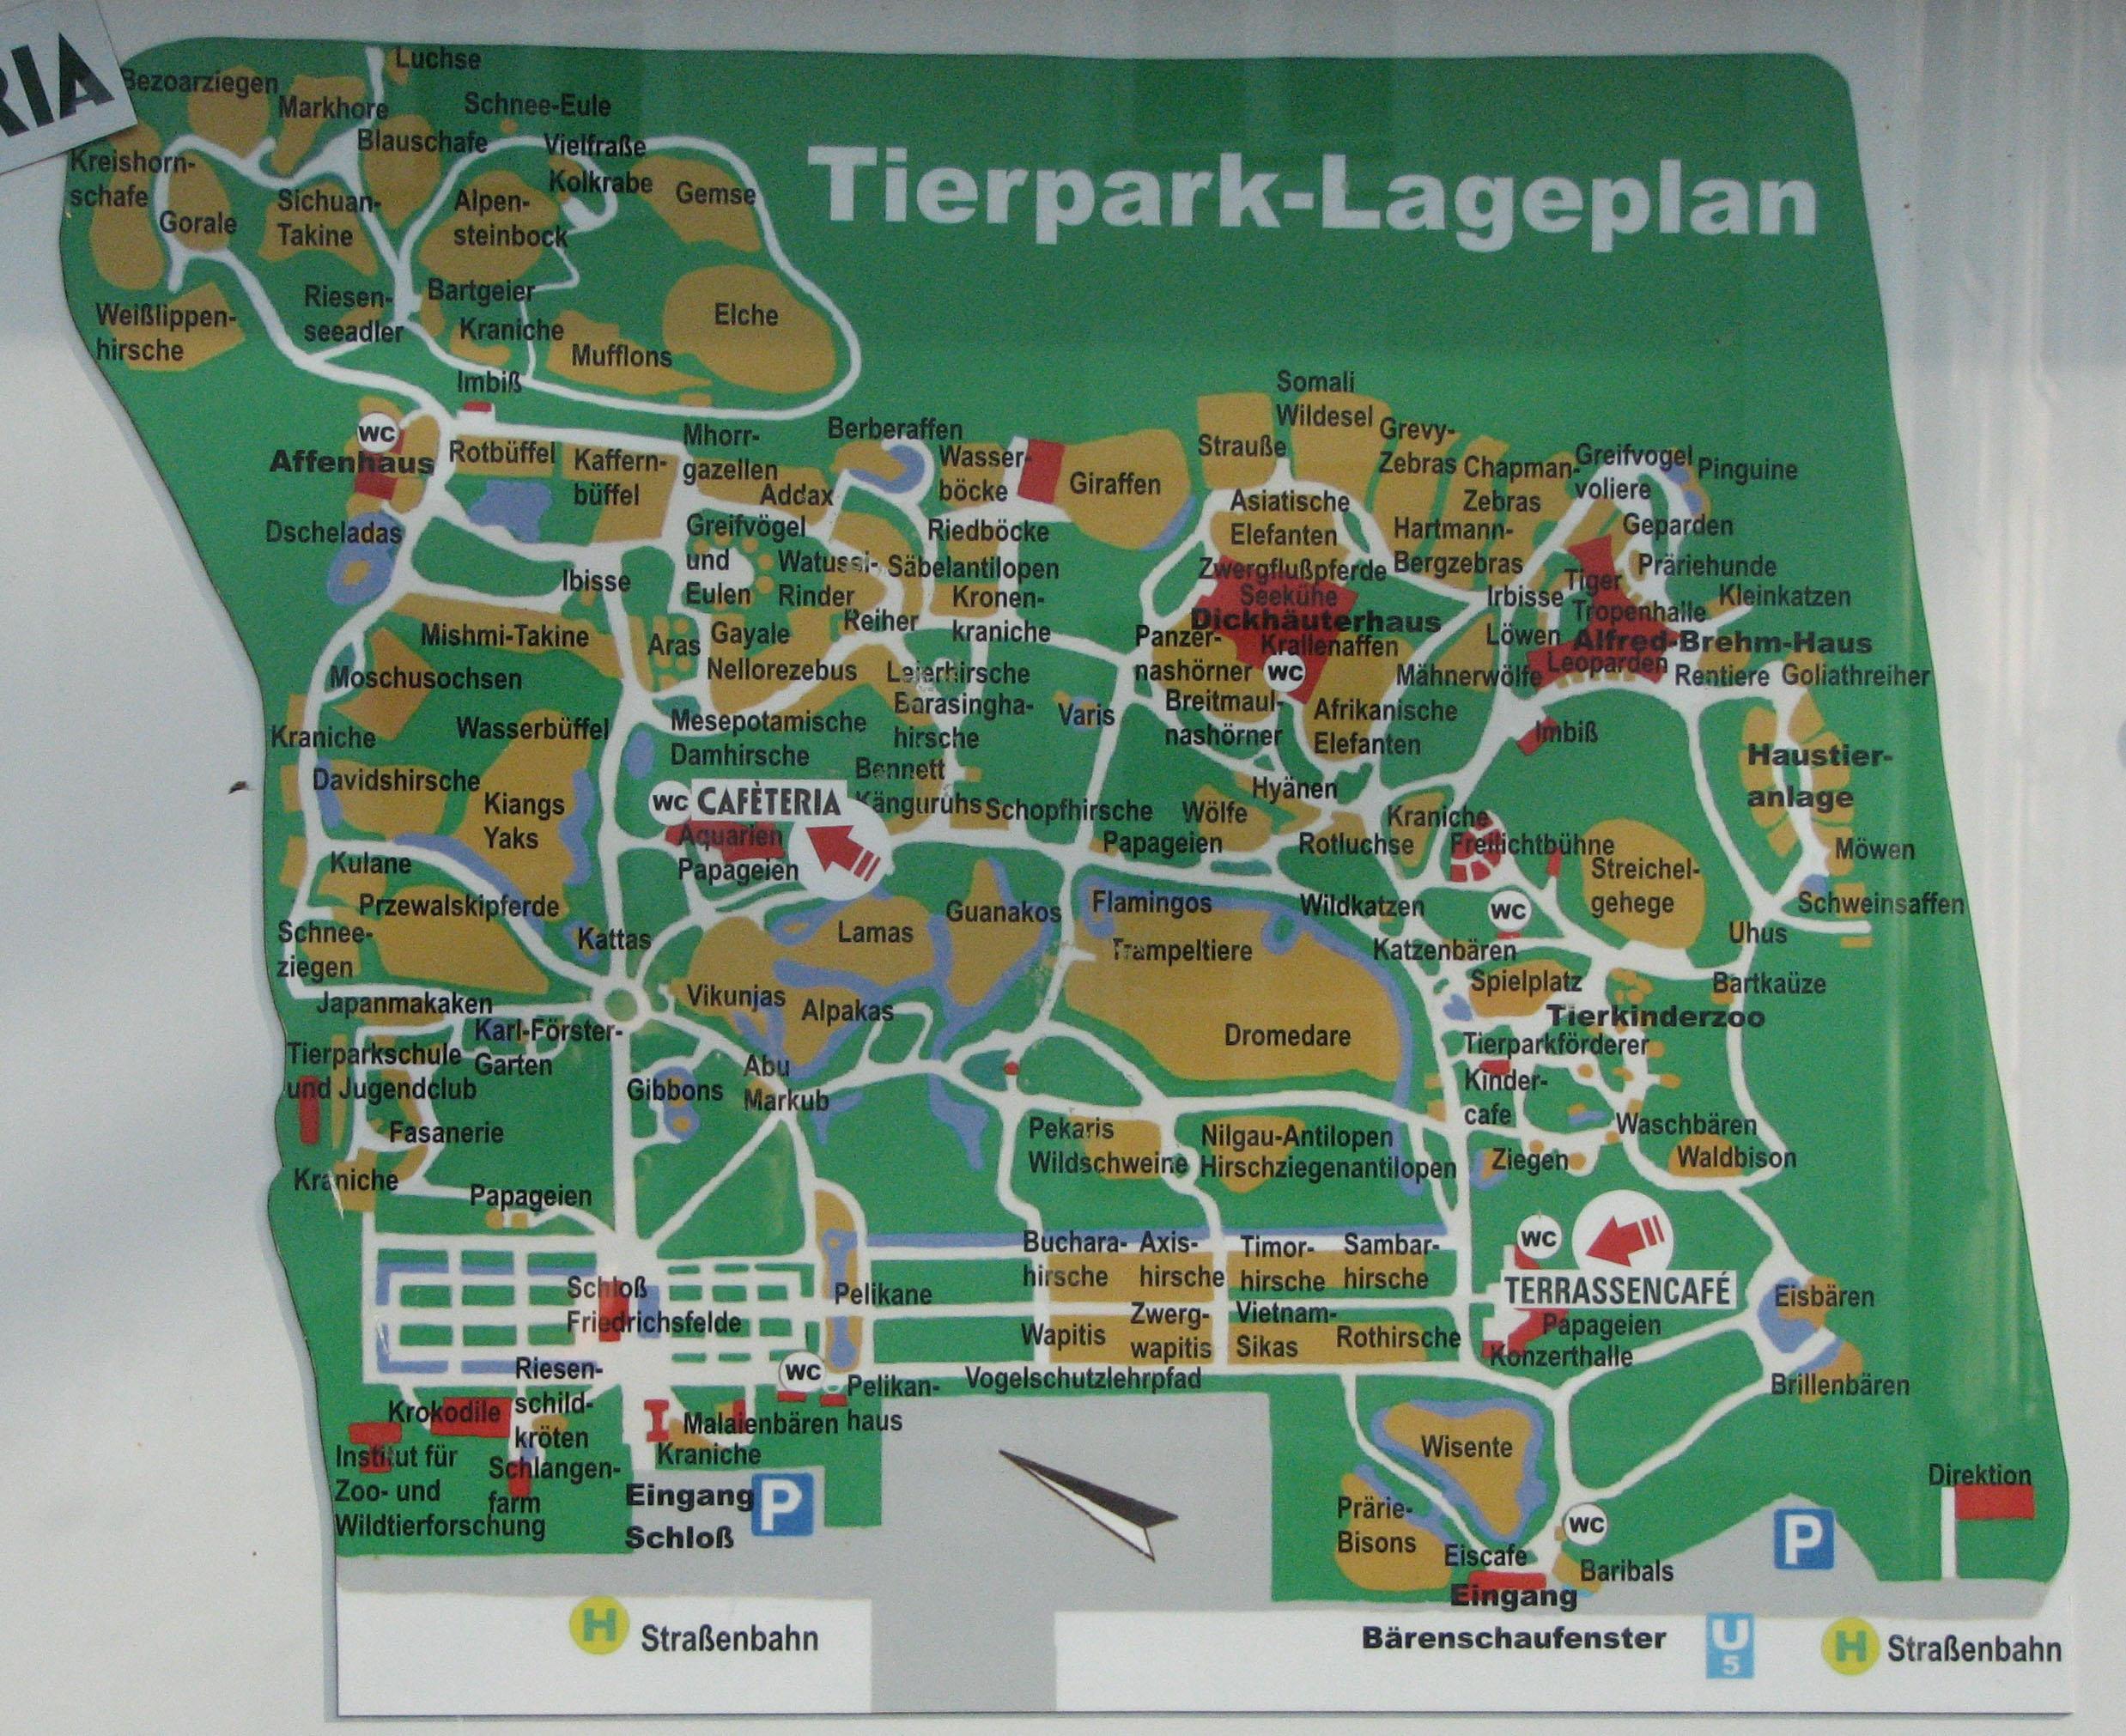 [Obrazek: Lageplan_Tierpark_Berlin.jpg]